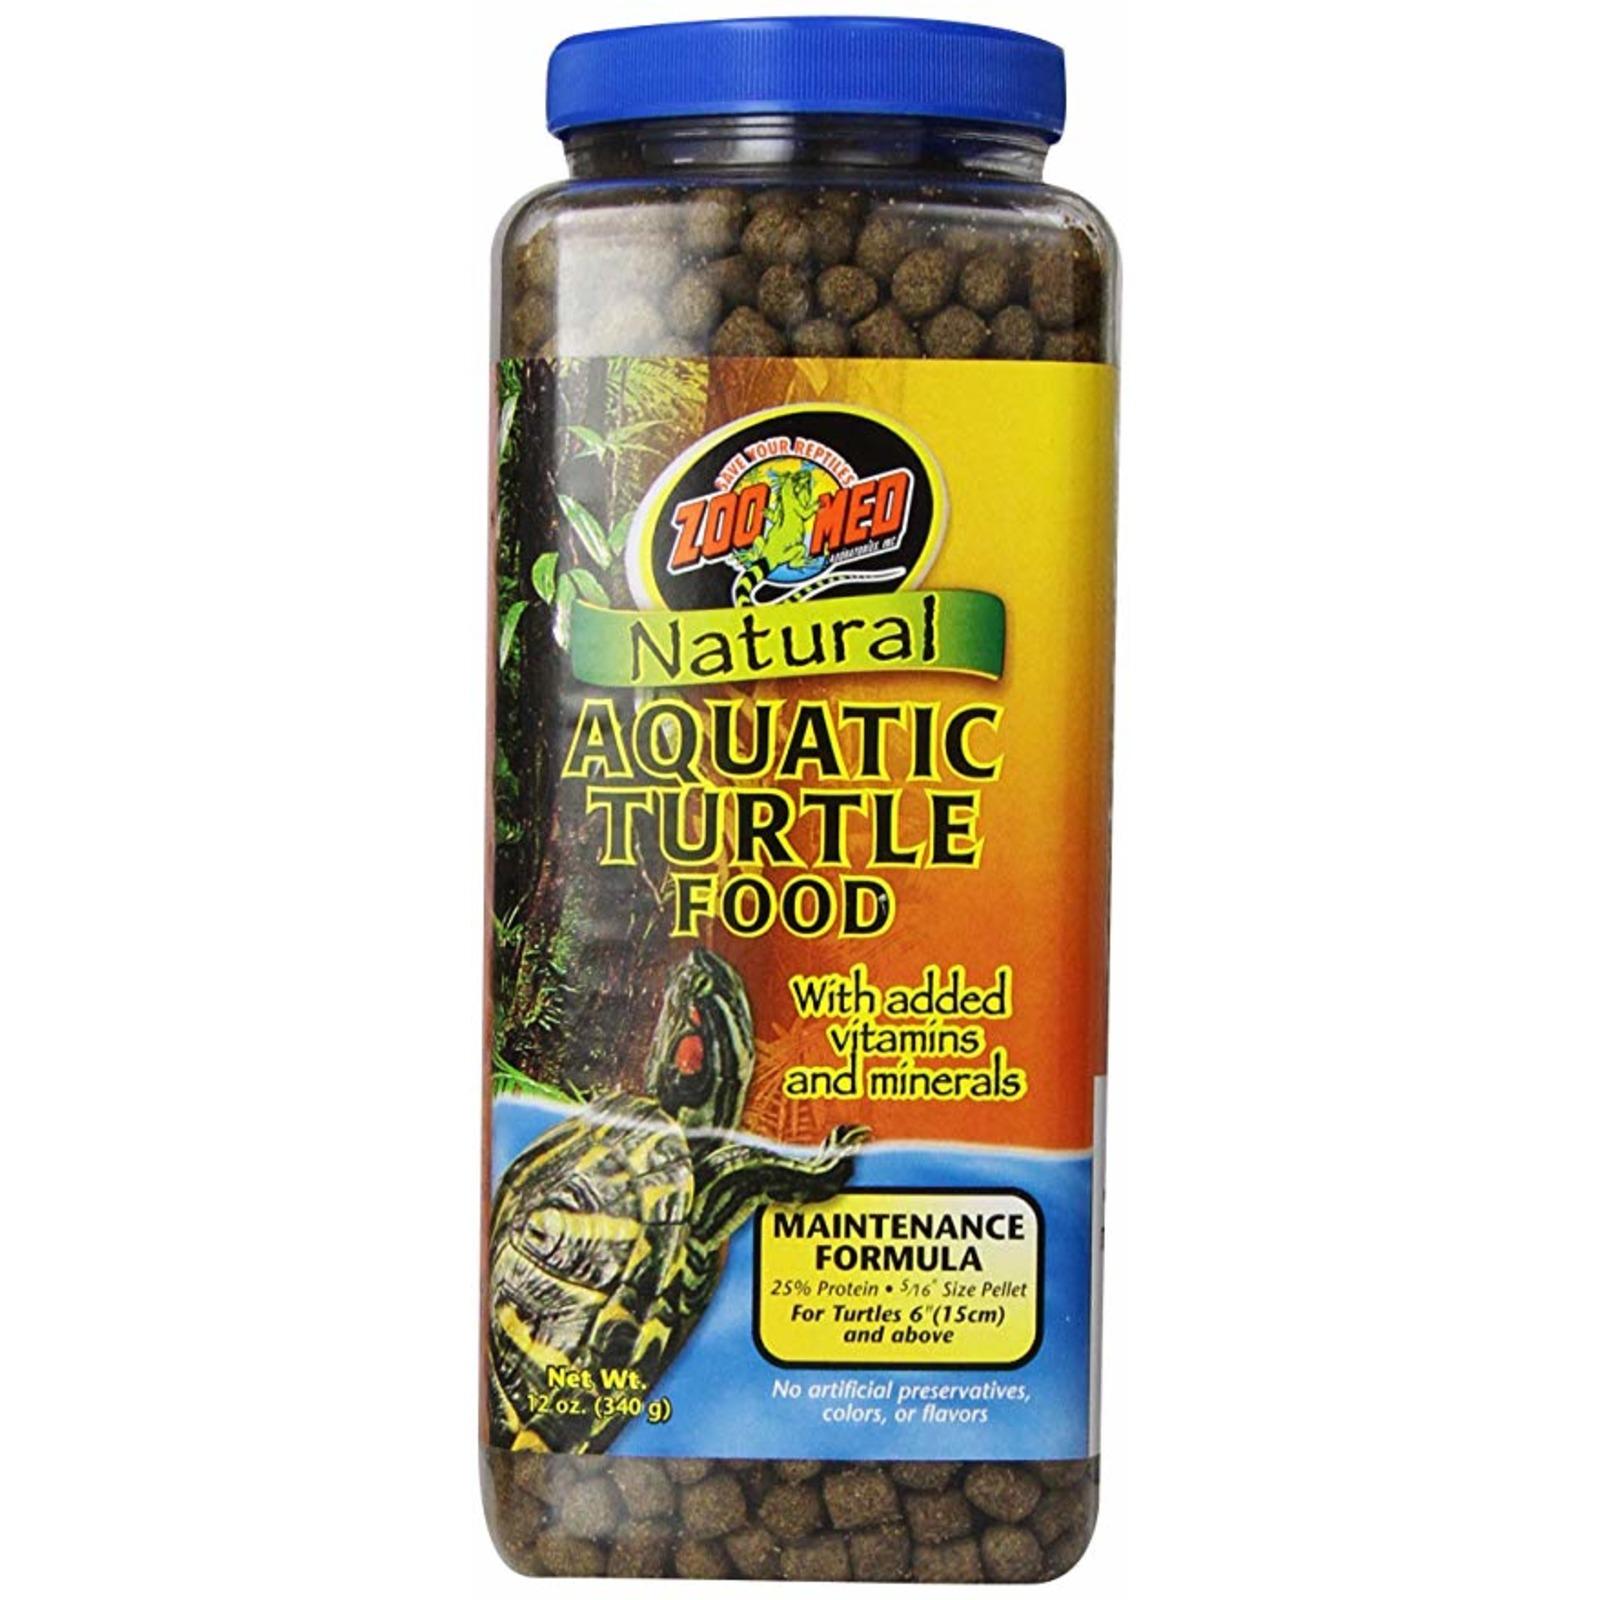 Zoo Med Natural Turtle Food - MAINT Formula